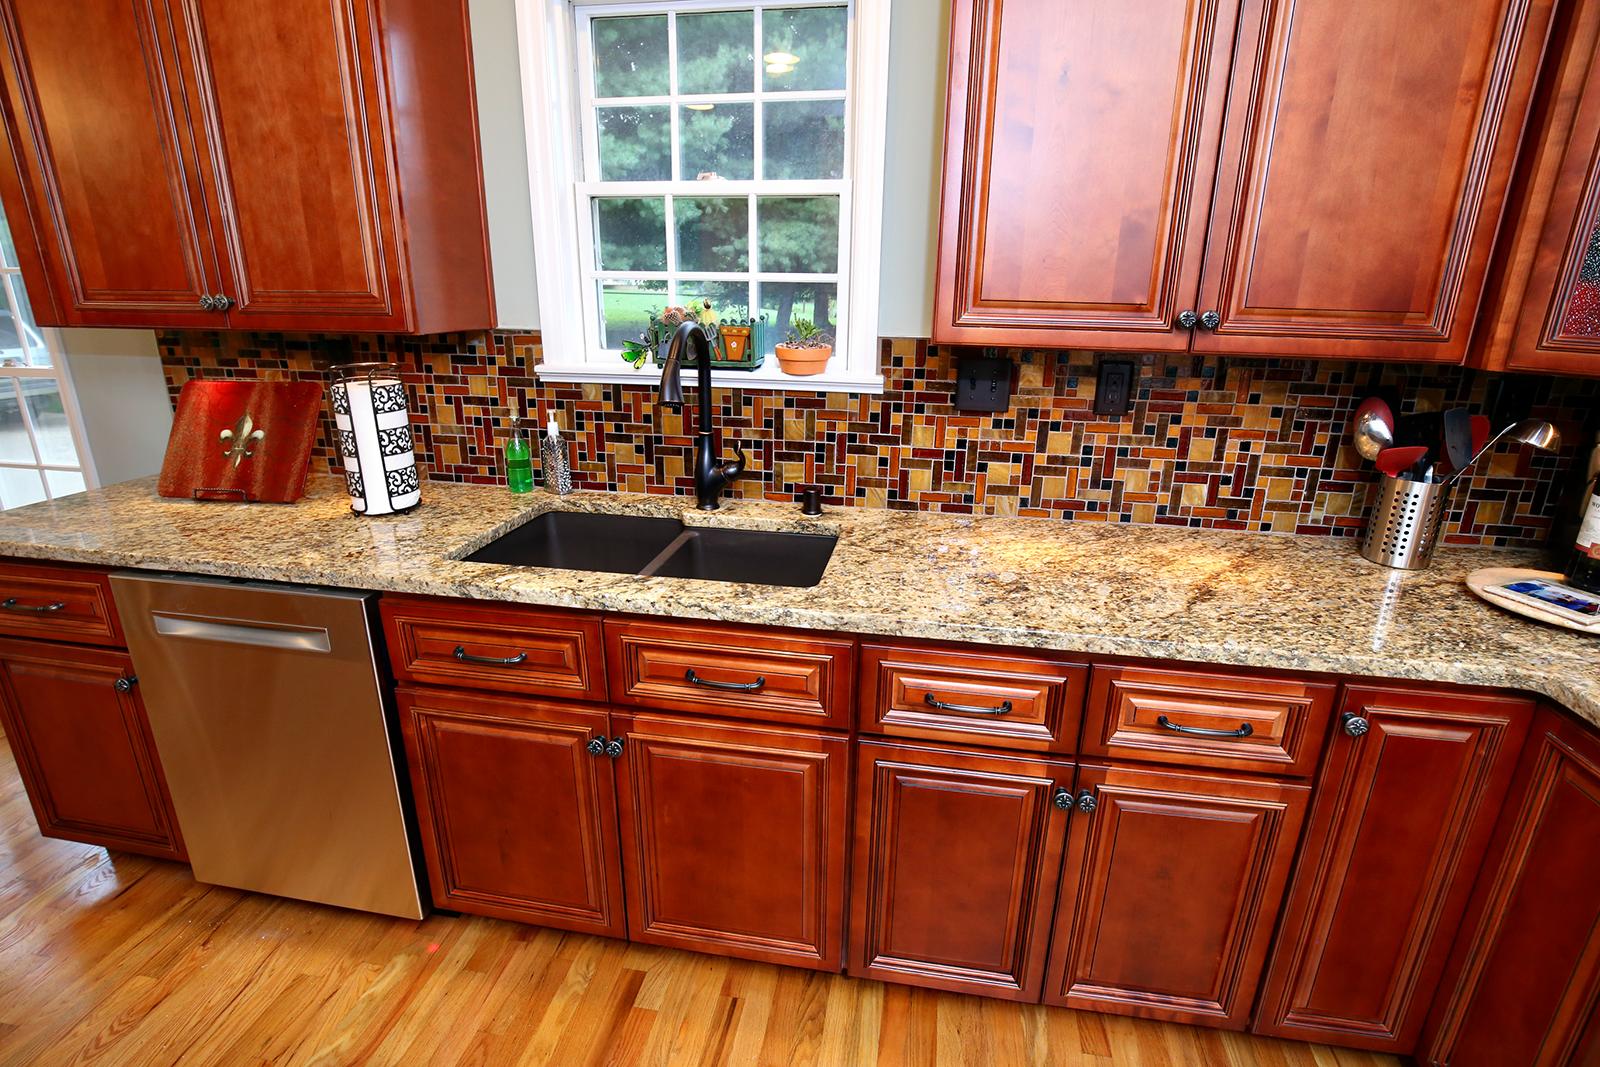 Kitchen Cabinet Distributors Adds 180 000 Sq Ft Plant 50 Jobs Randle Report